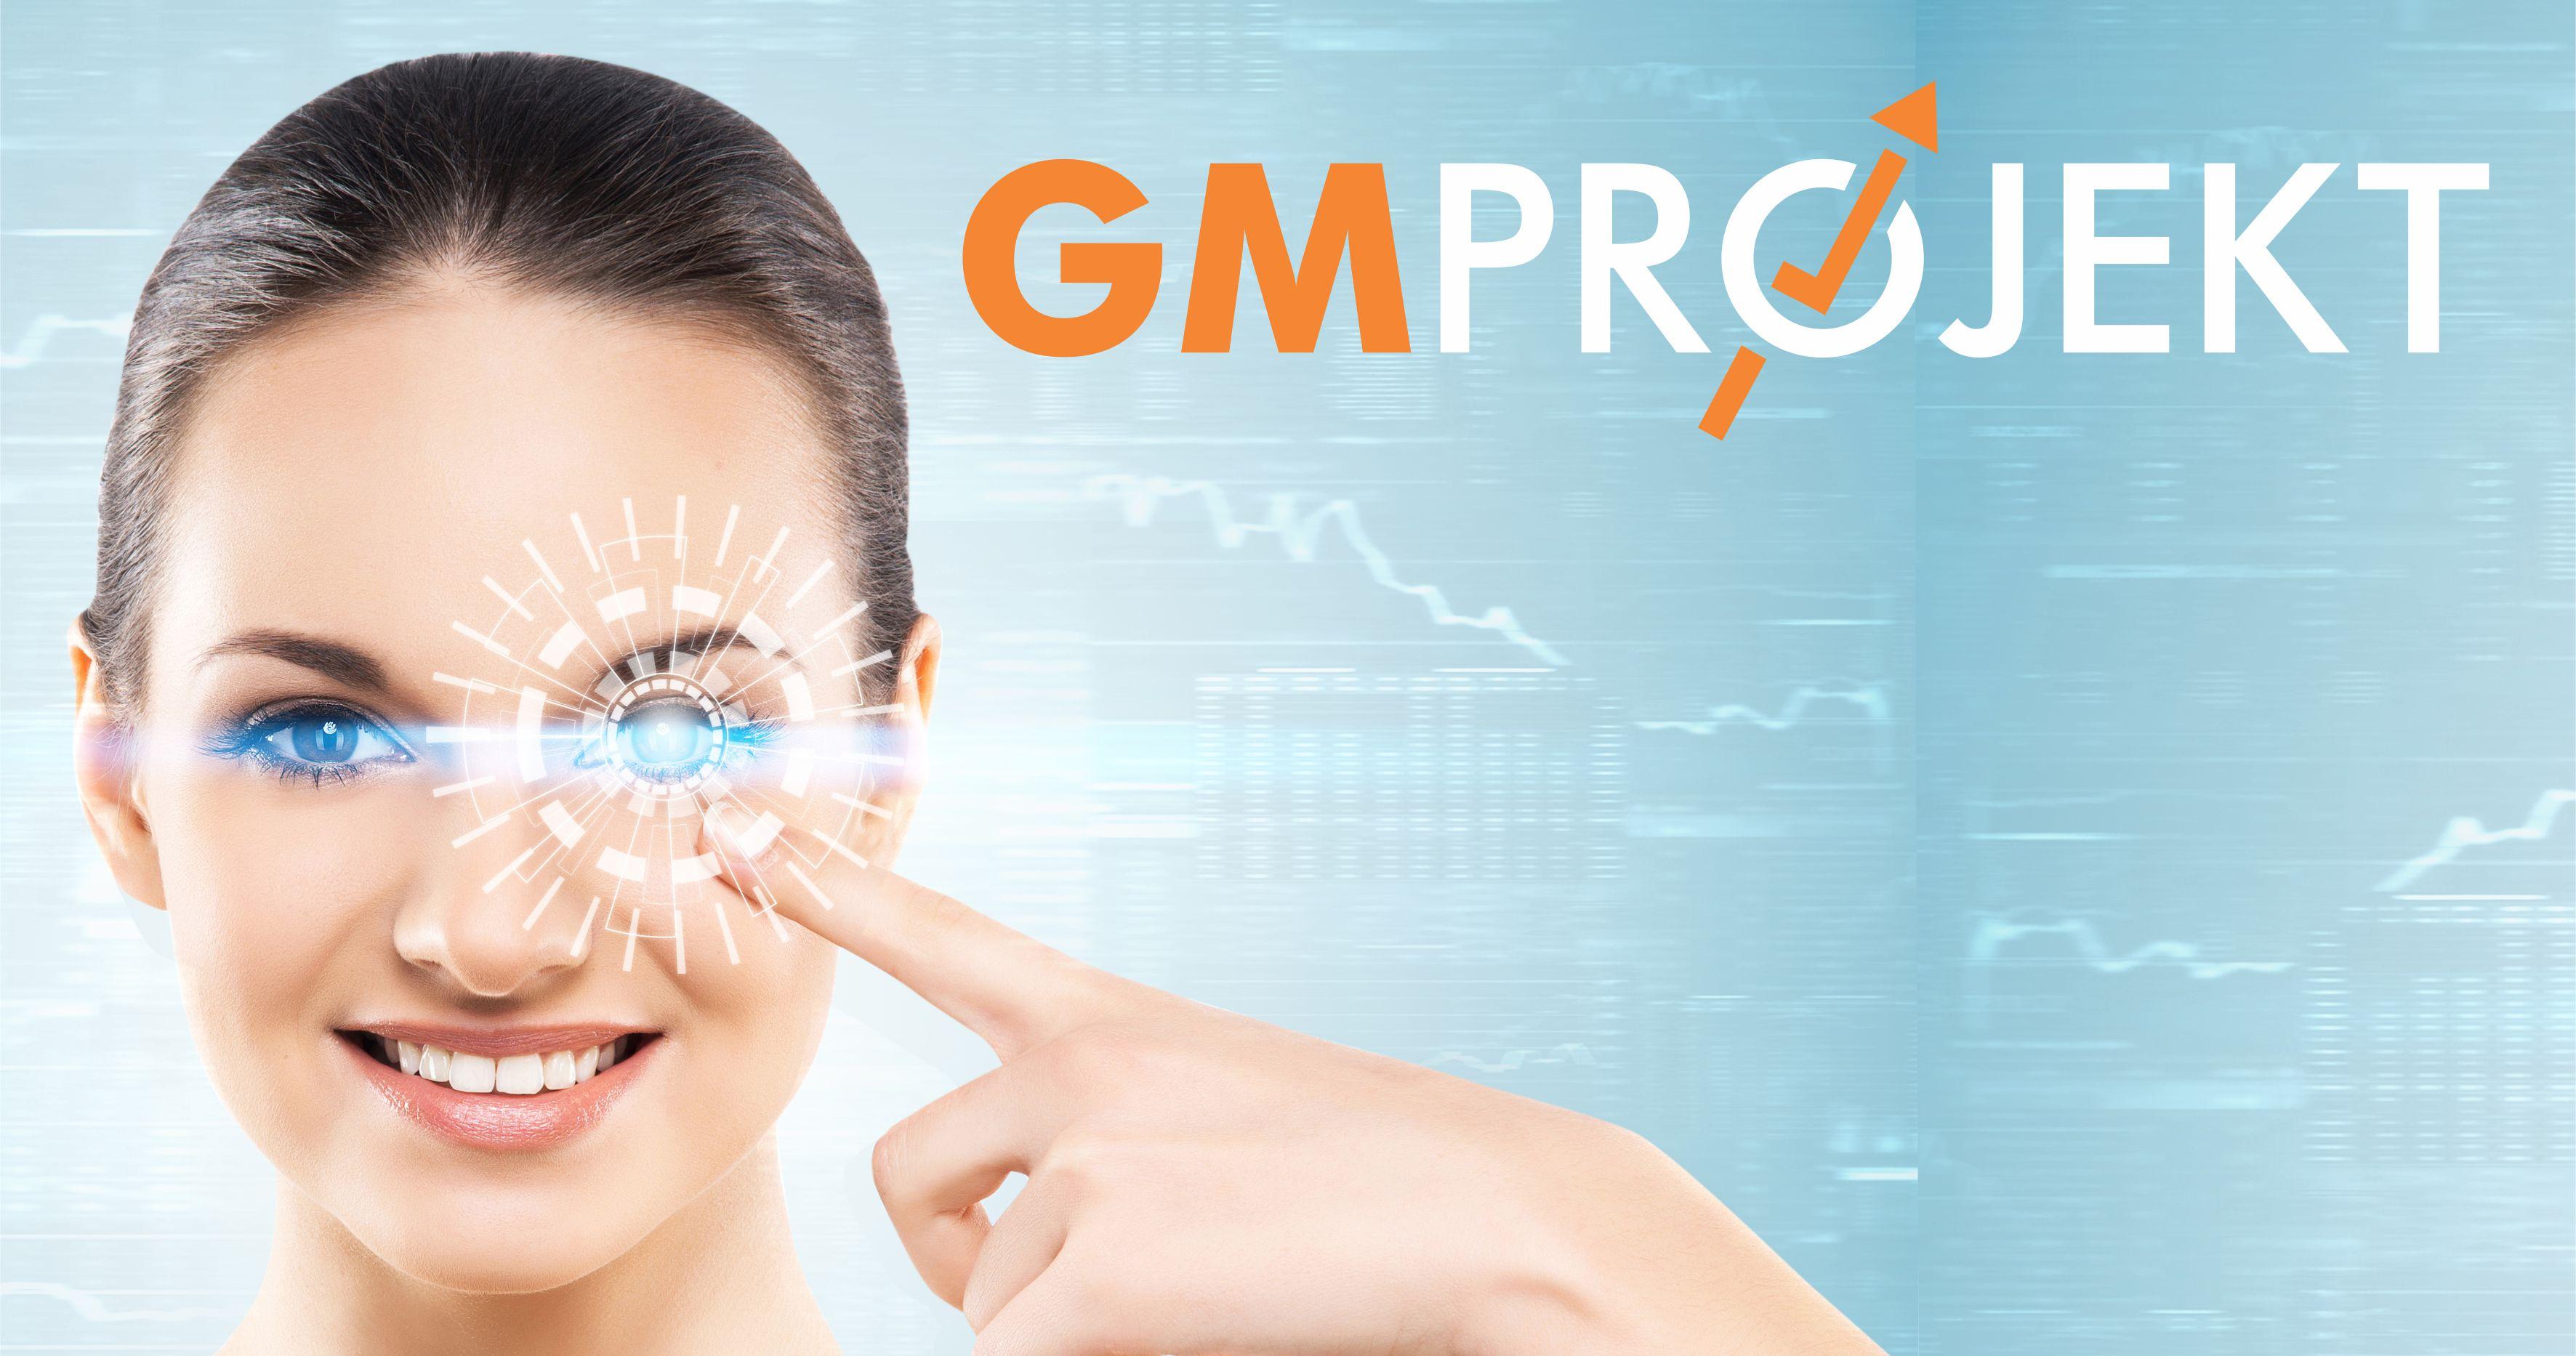 GM Projekt